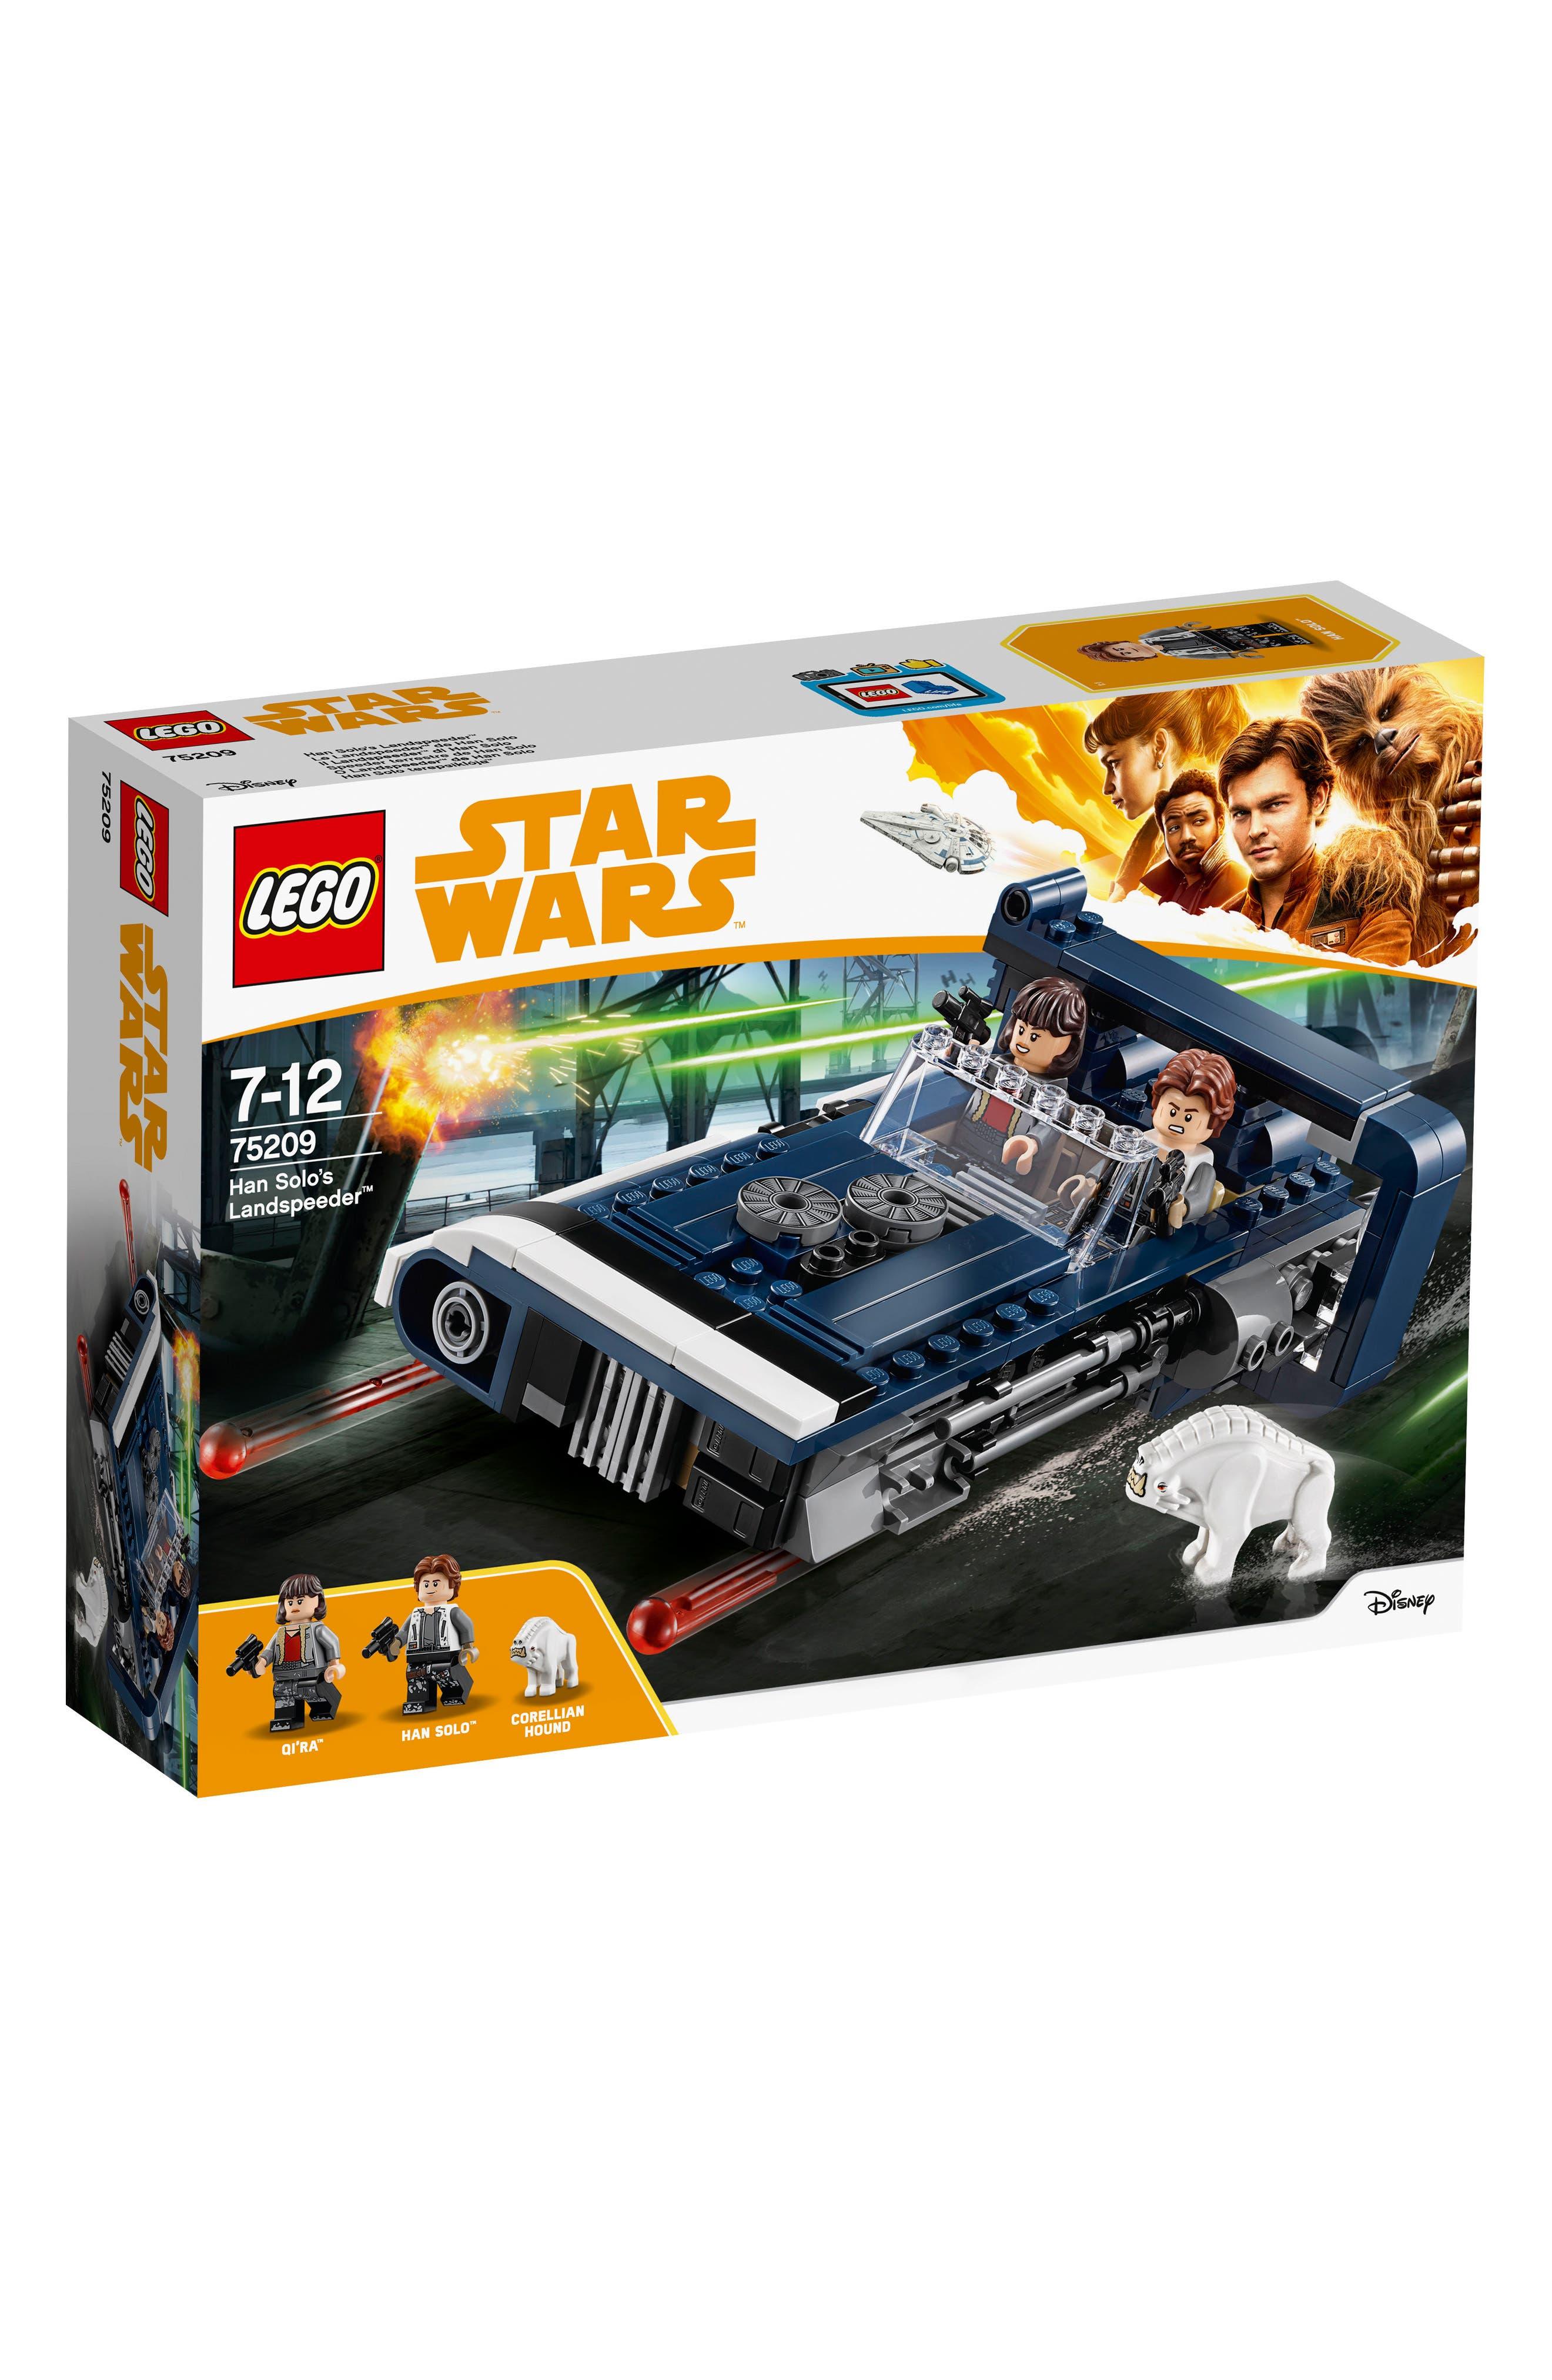 Star Wars<sup>®</sup> Han Solo's Landspeeder<sup>™</sup> - 75209,                         Main,                         color, 400